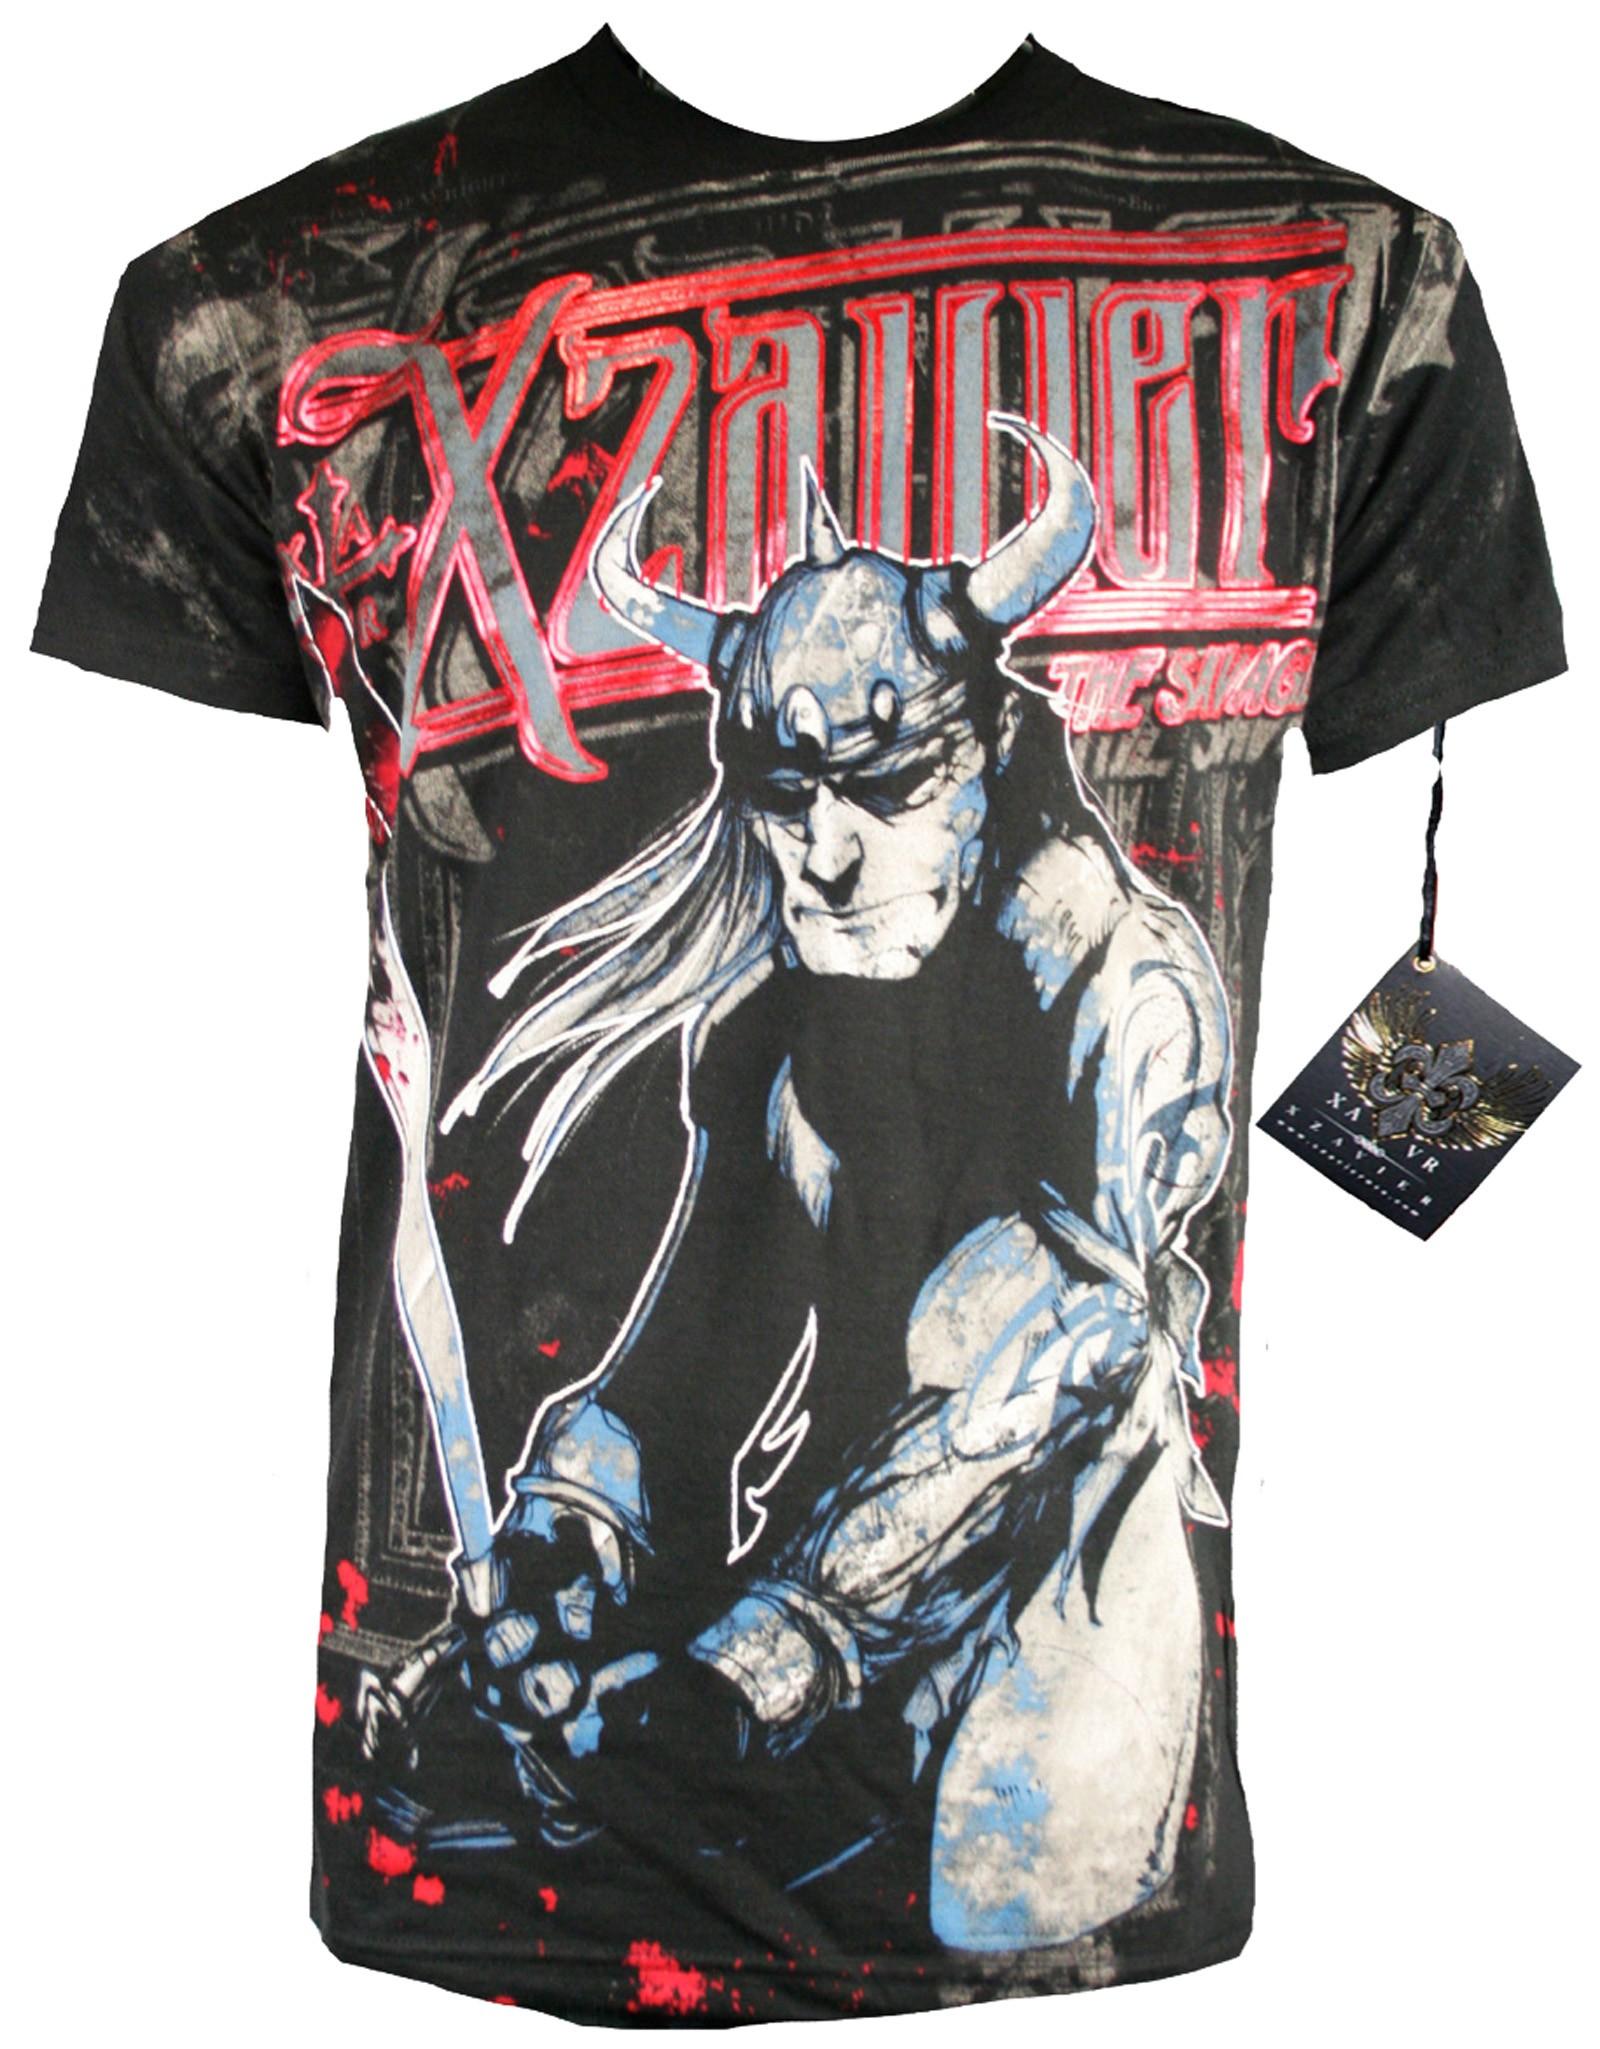 Xzavier - Savage T-Shirt Front